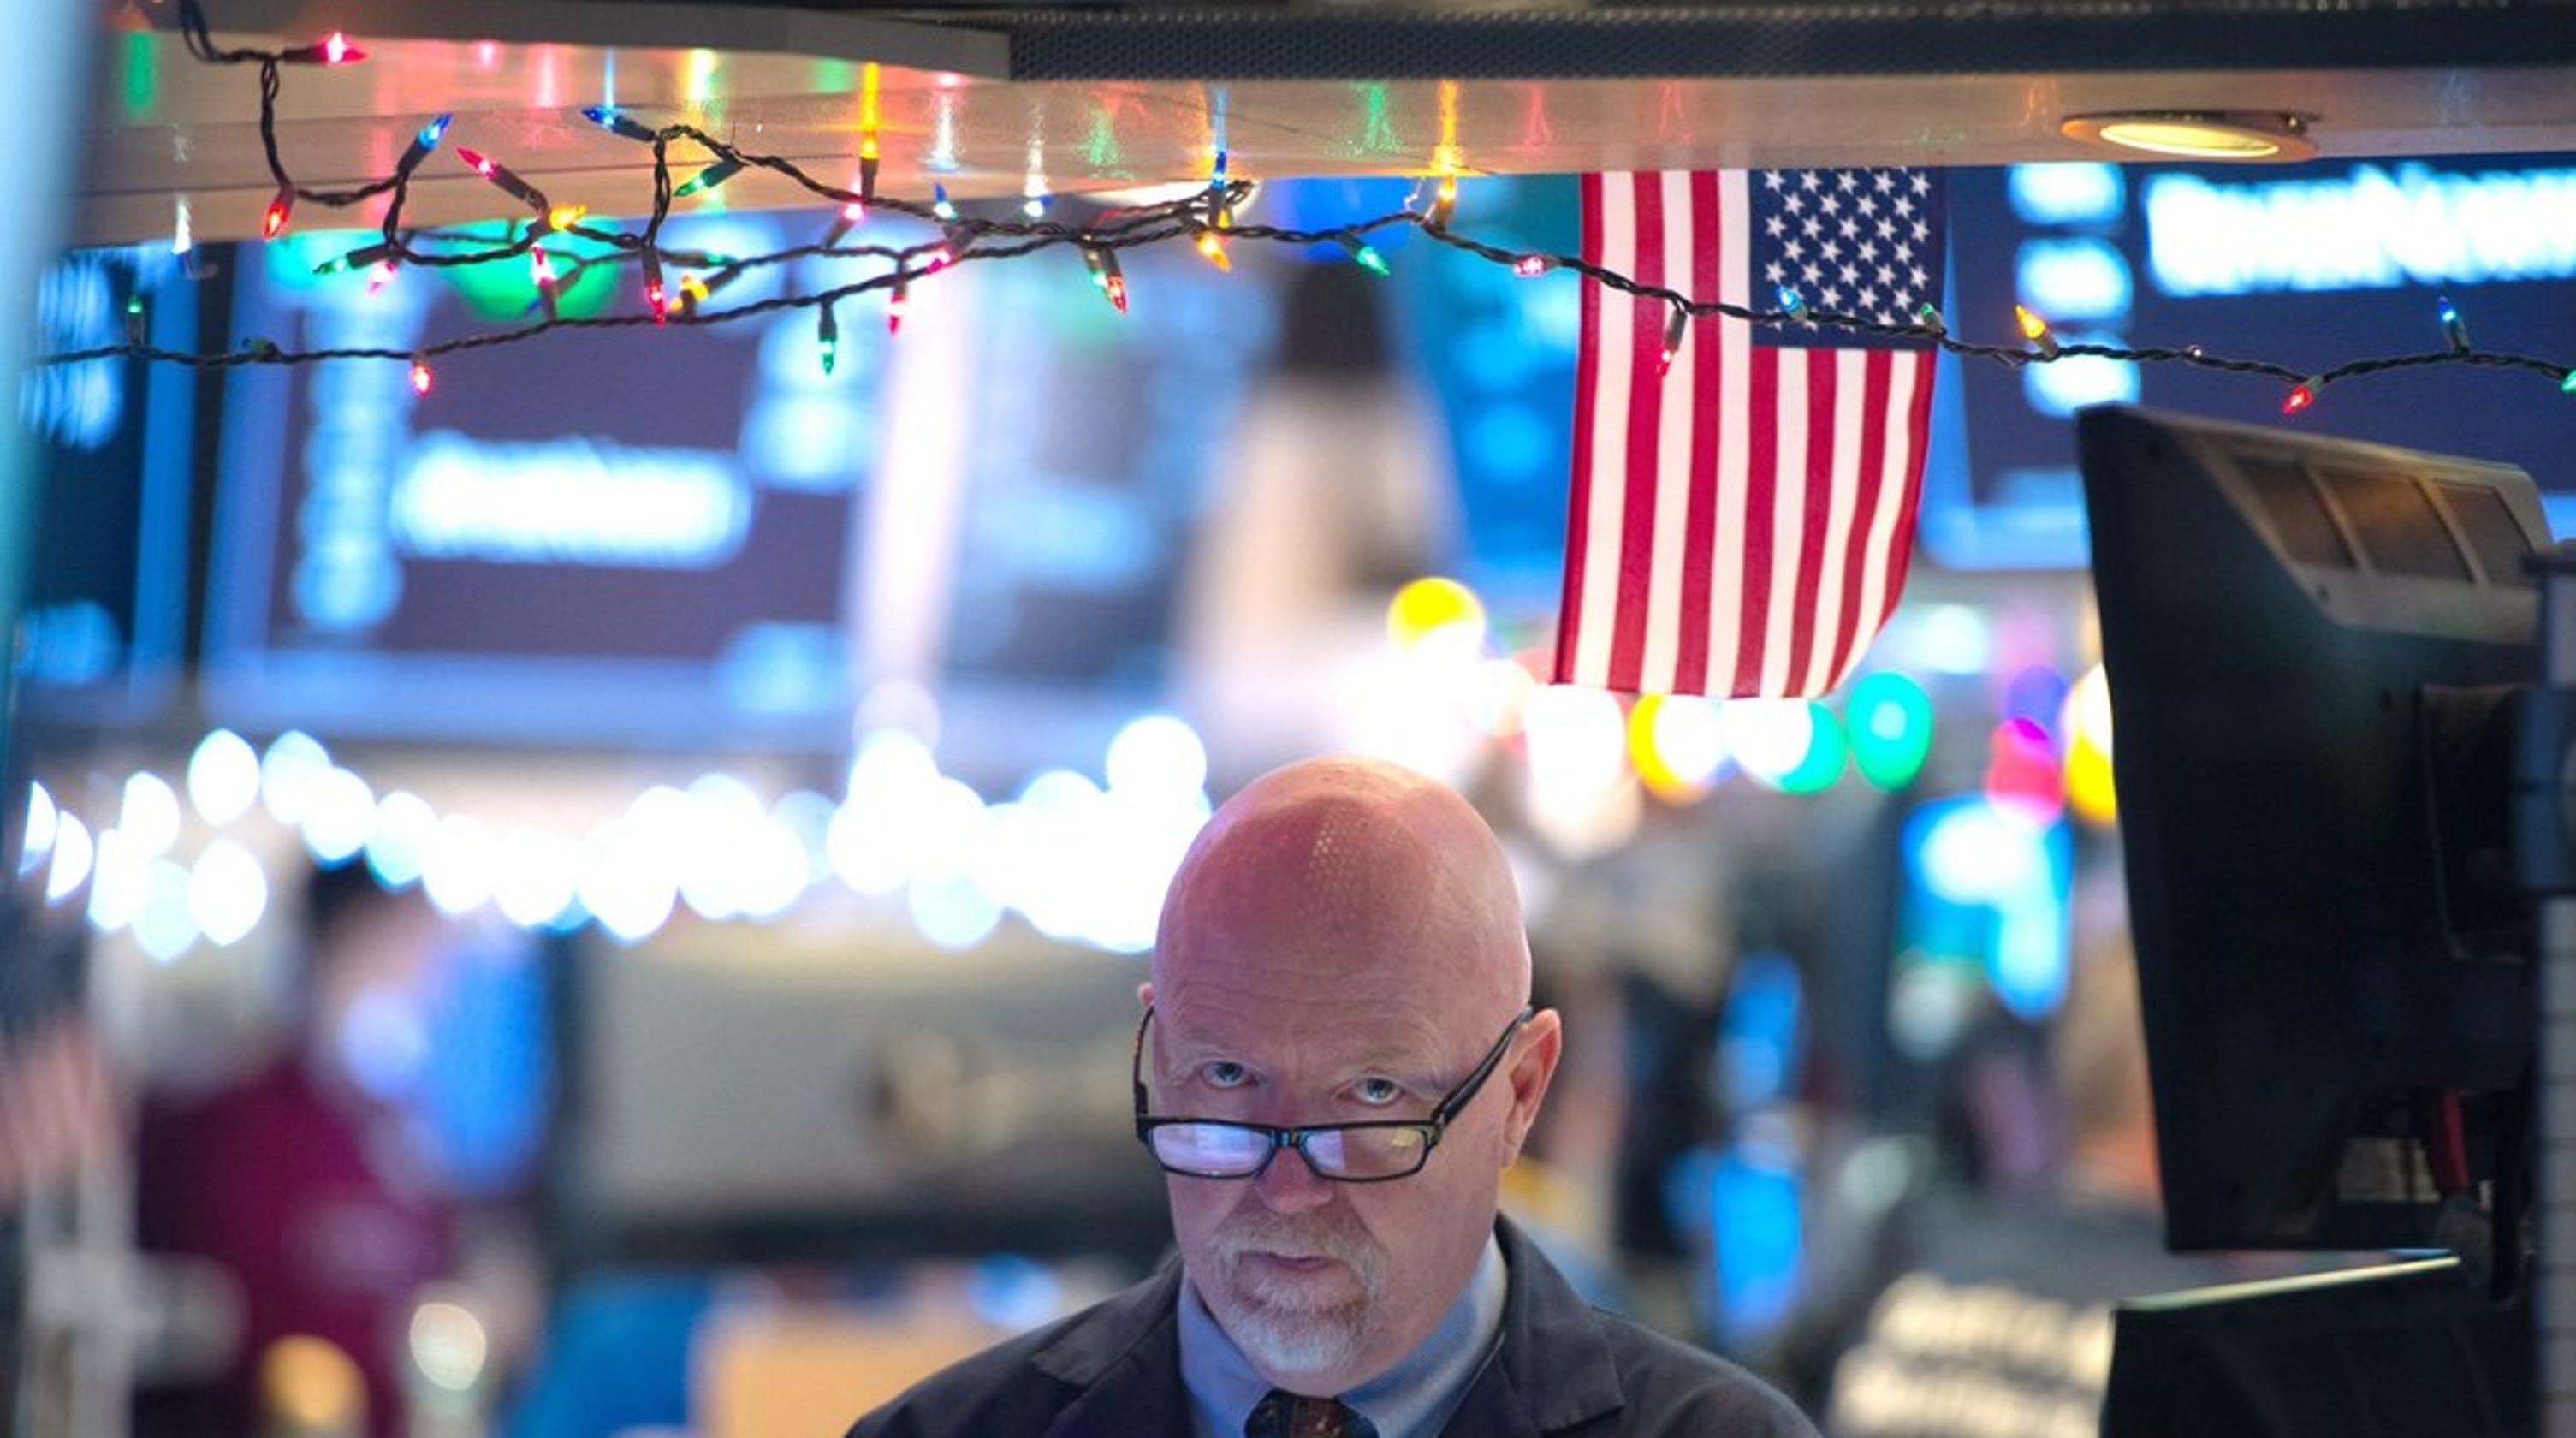 59d6003cec9 Stock market downturn smells like a bear